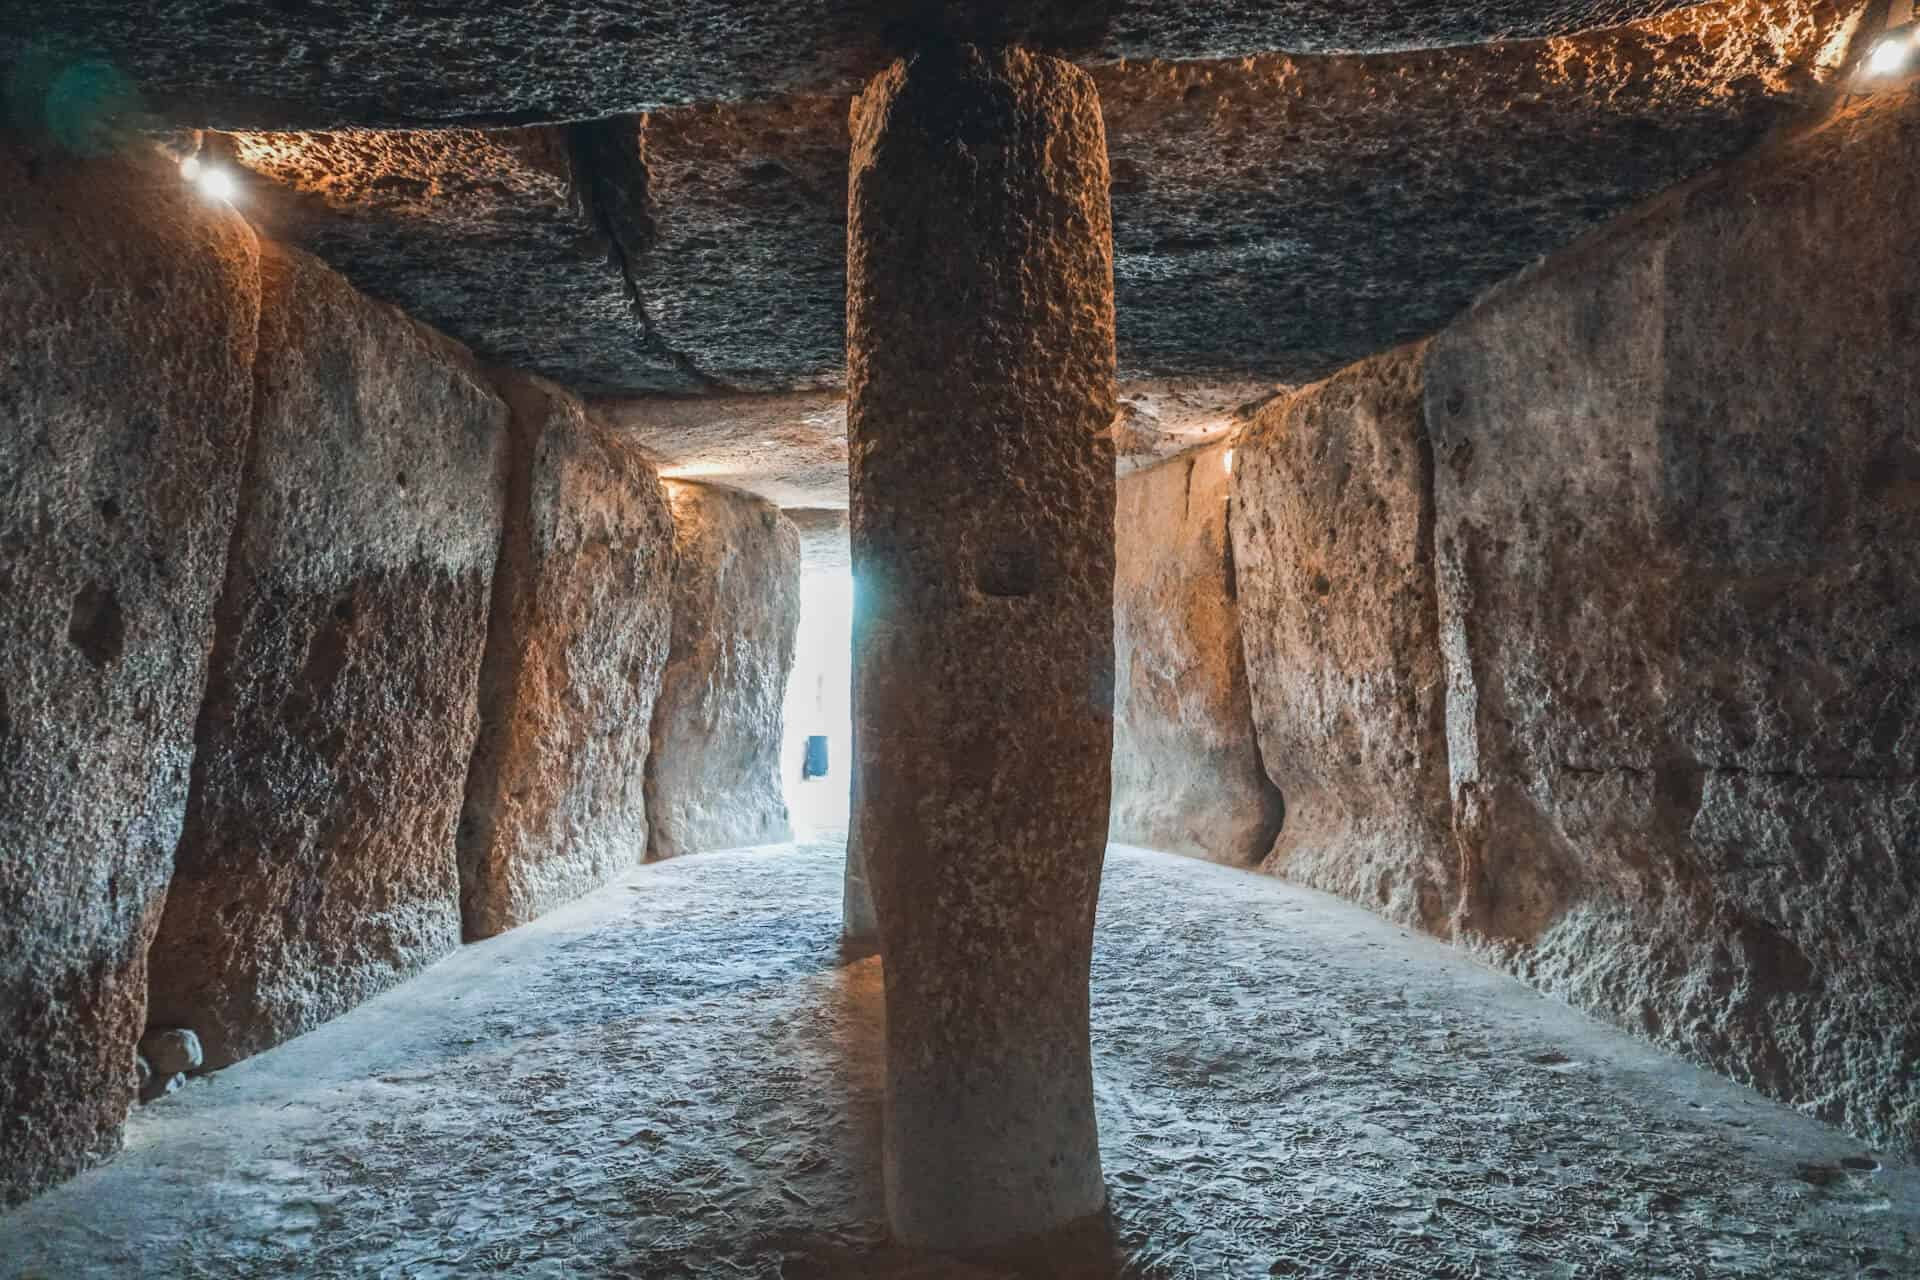 que ver cerca del torcal dolmenes de antequera